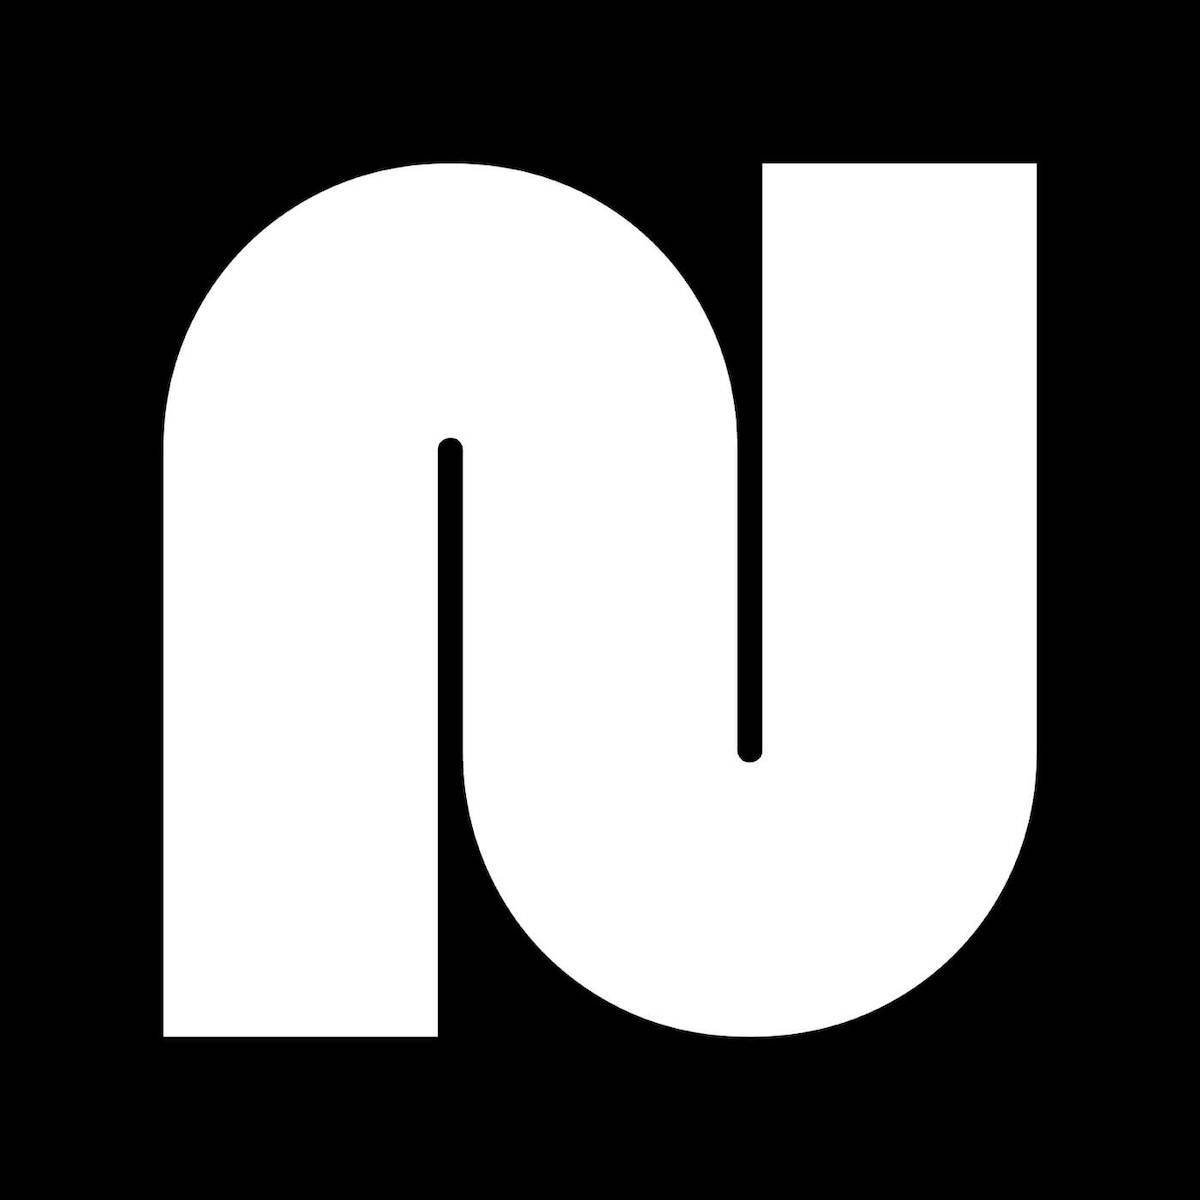 Night Variable Display Font 'N'